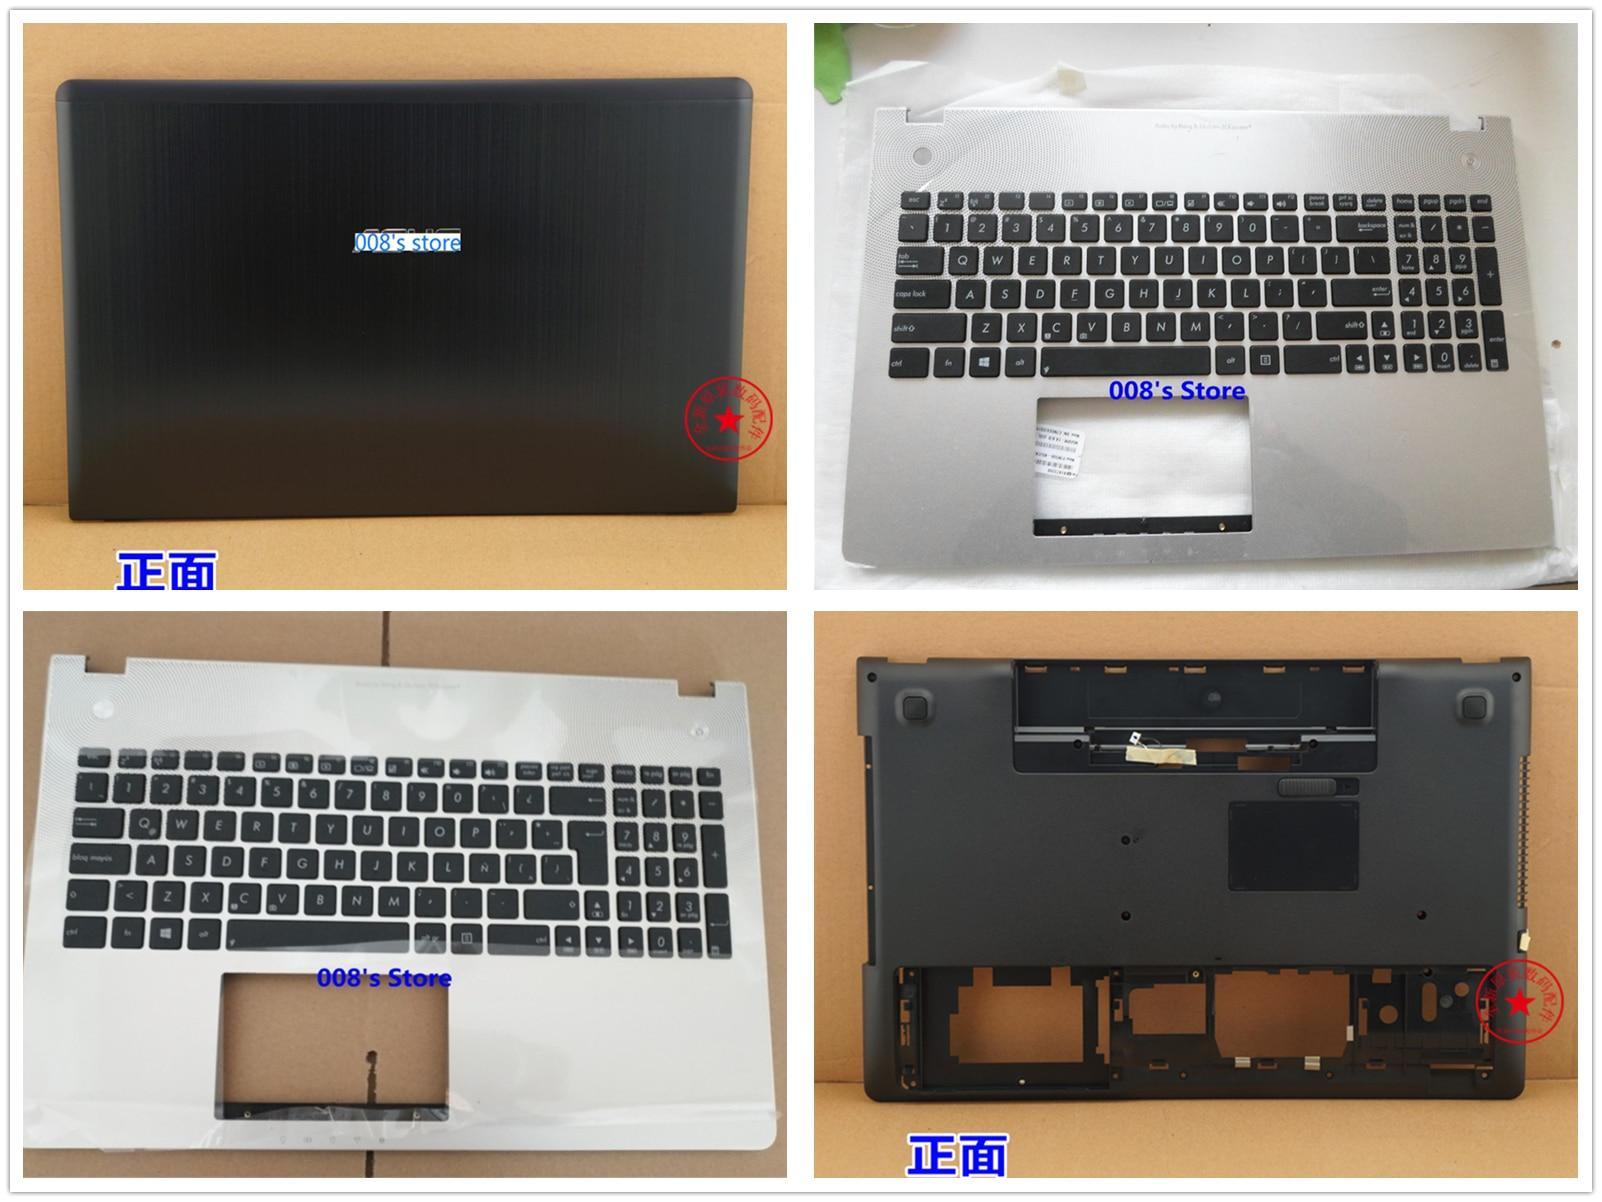 New Cover For Asus N56J N56JN N56Jk N56JR N56JP 13NB04Z1AM0201 LCD Back/Palmrest/Bottom Base/Memory Hard Disk Case/keyboard